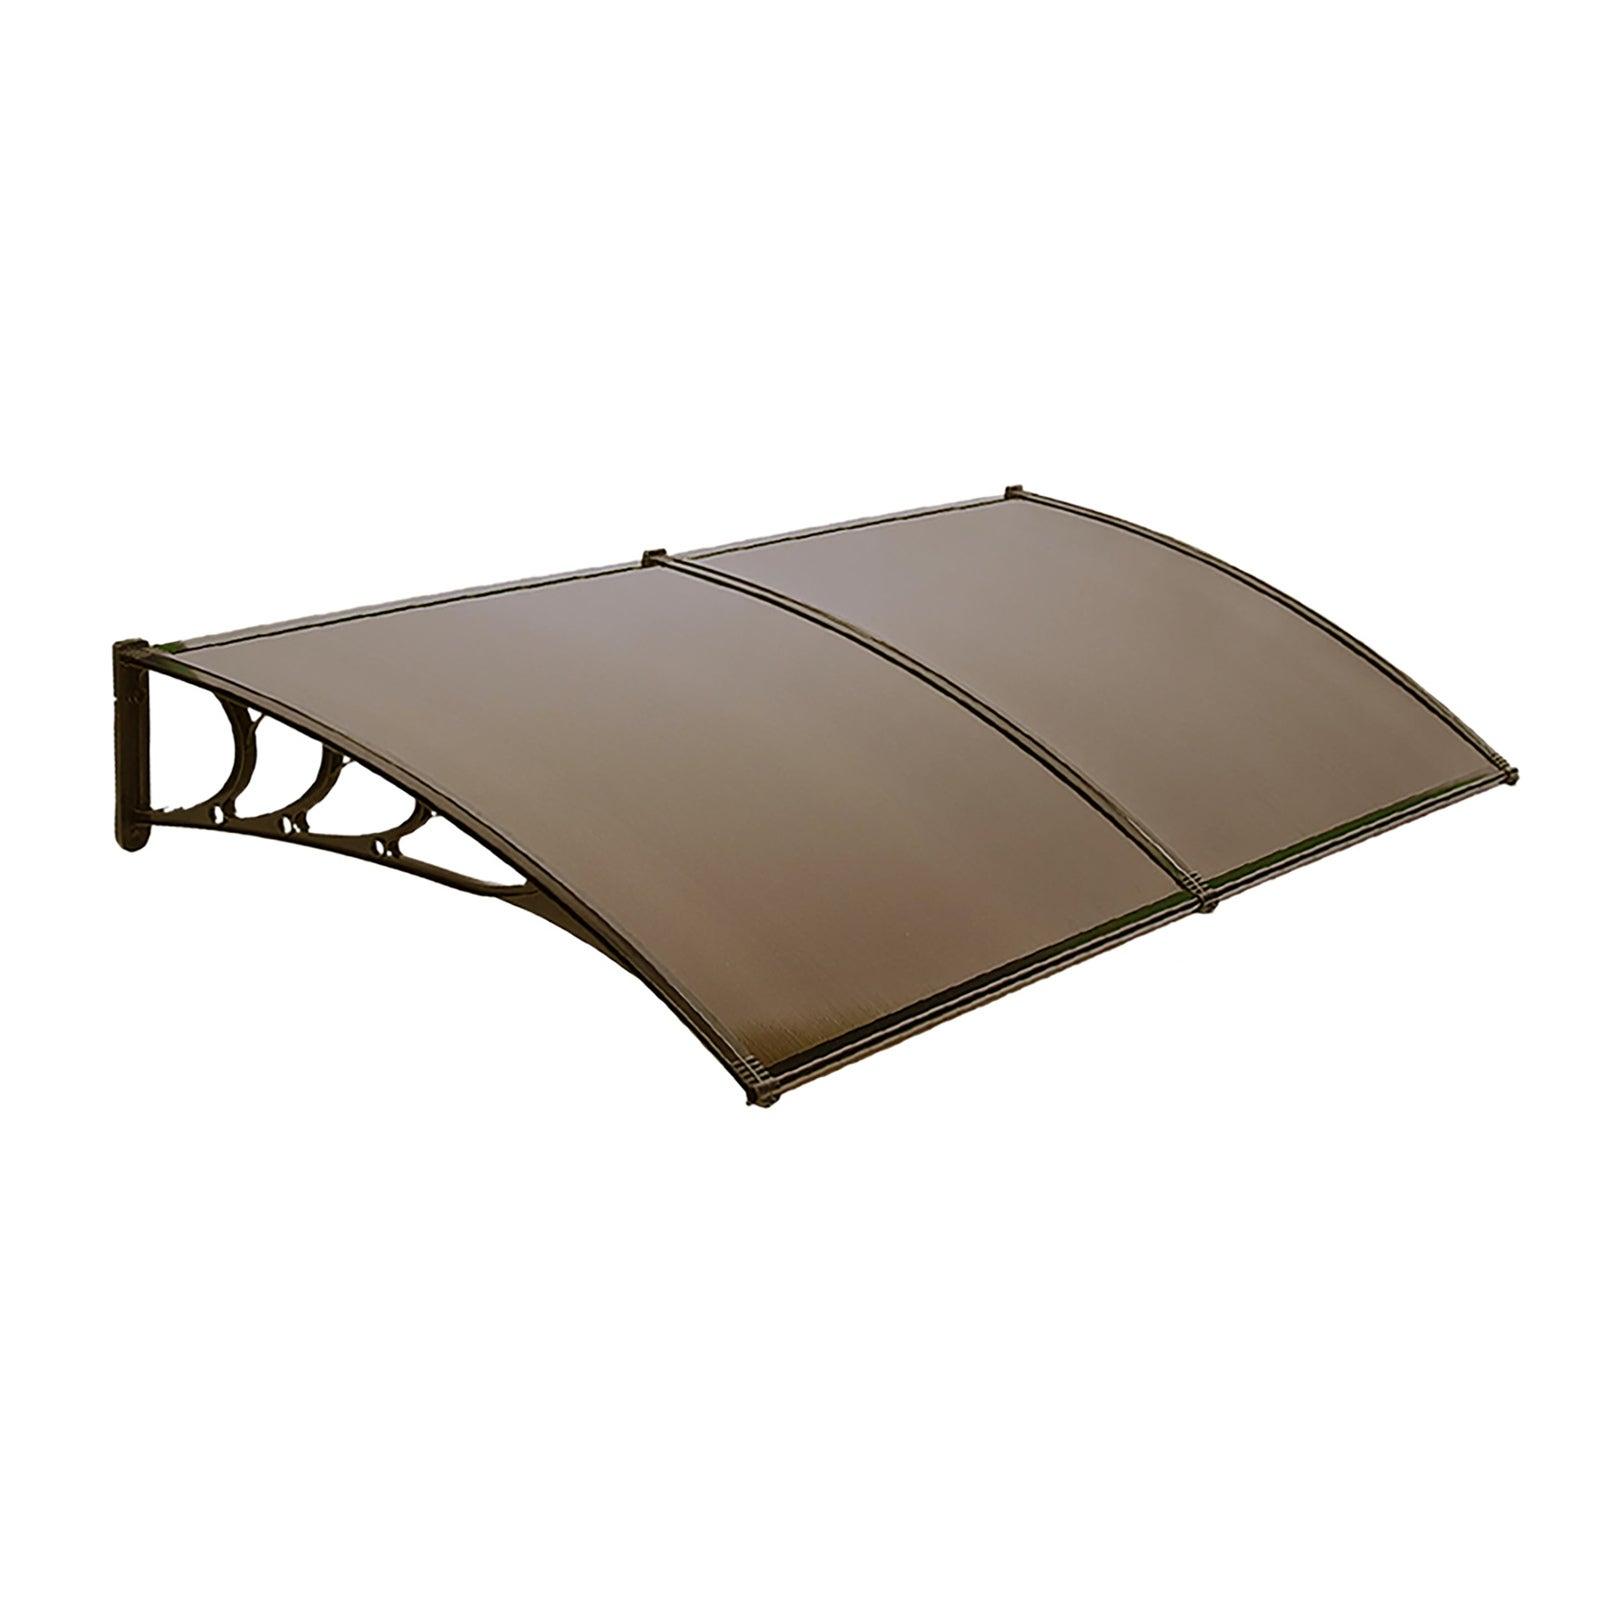 1m x 2m Glasshaus Window Awning Door Awning Door Canopy Outdoor Patio Sun Shield DIY